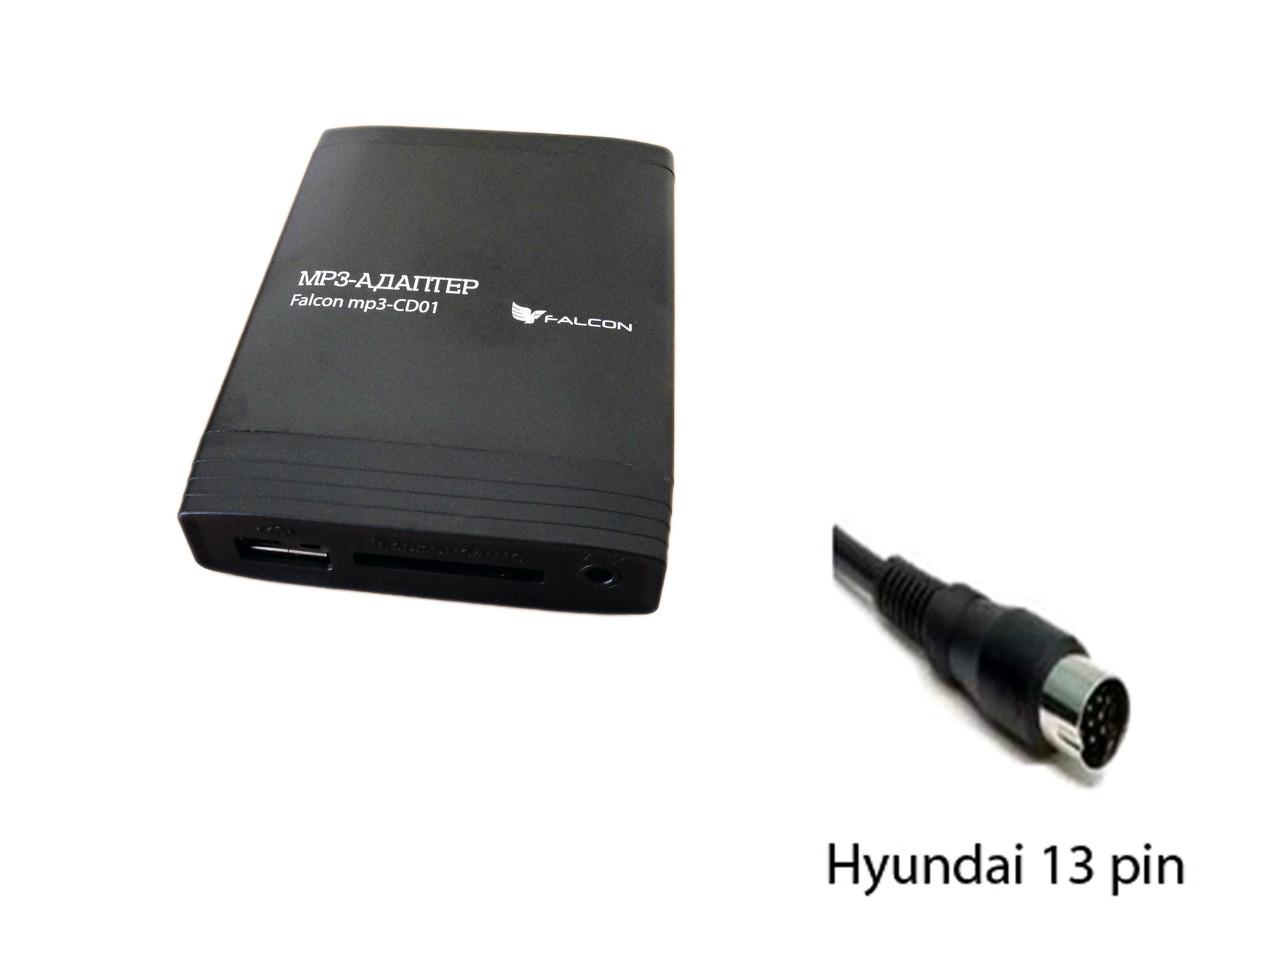 MP3 адаптеры Falcon MP3-CD01 Hyndai (13 pin)